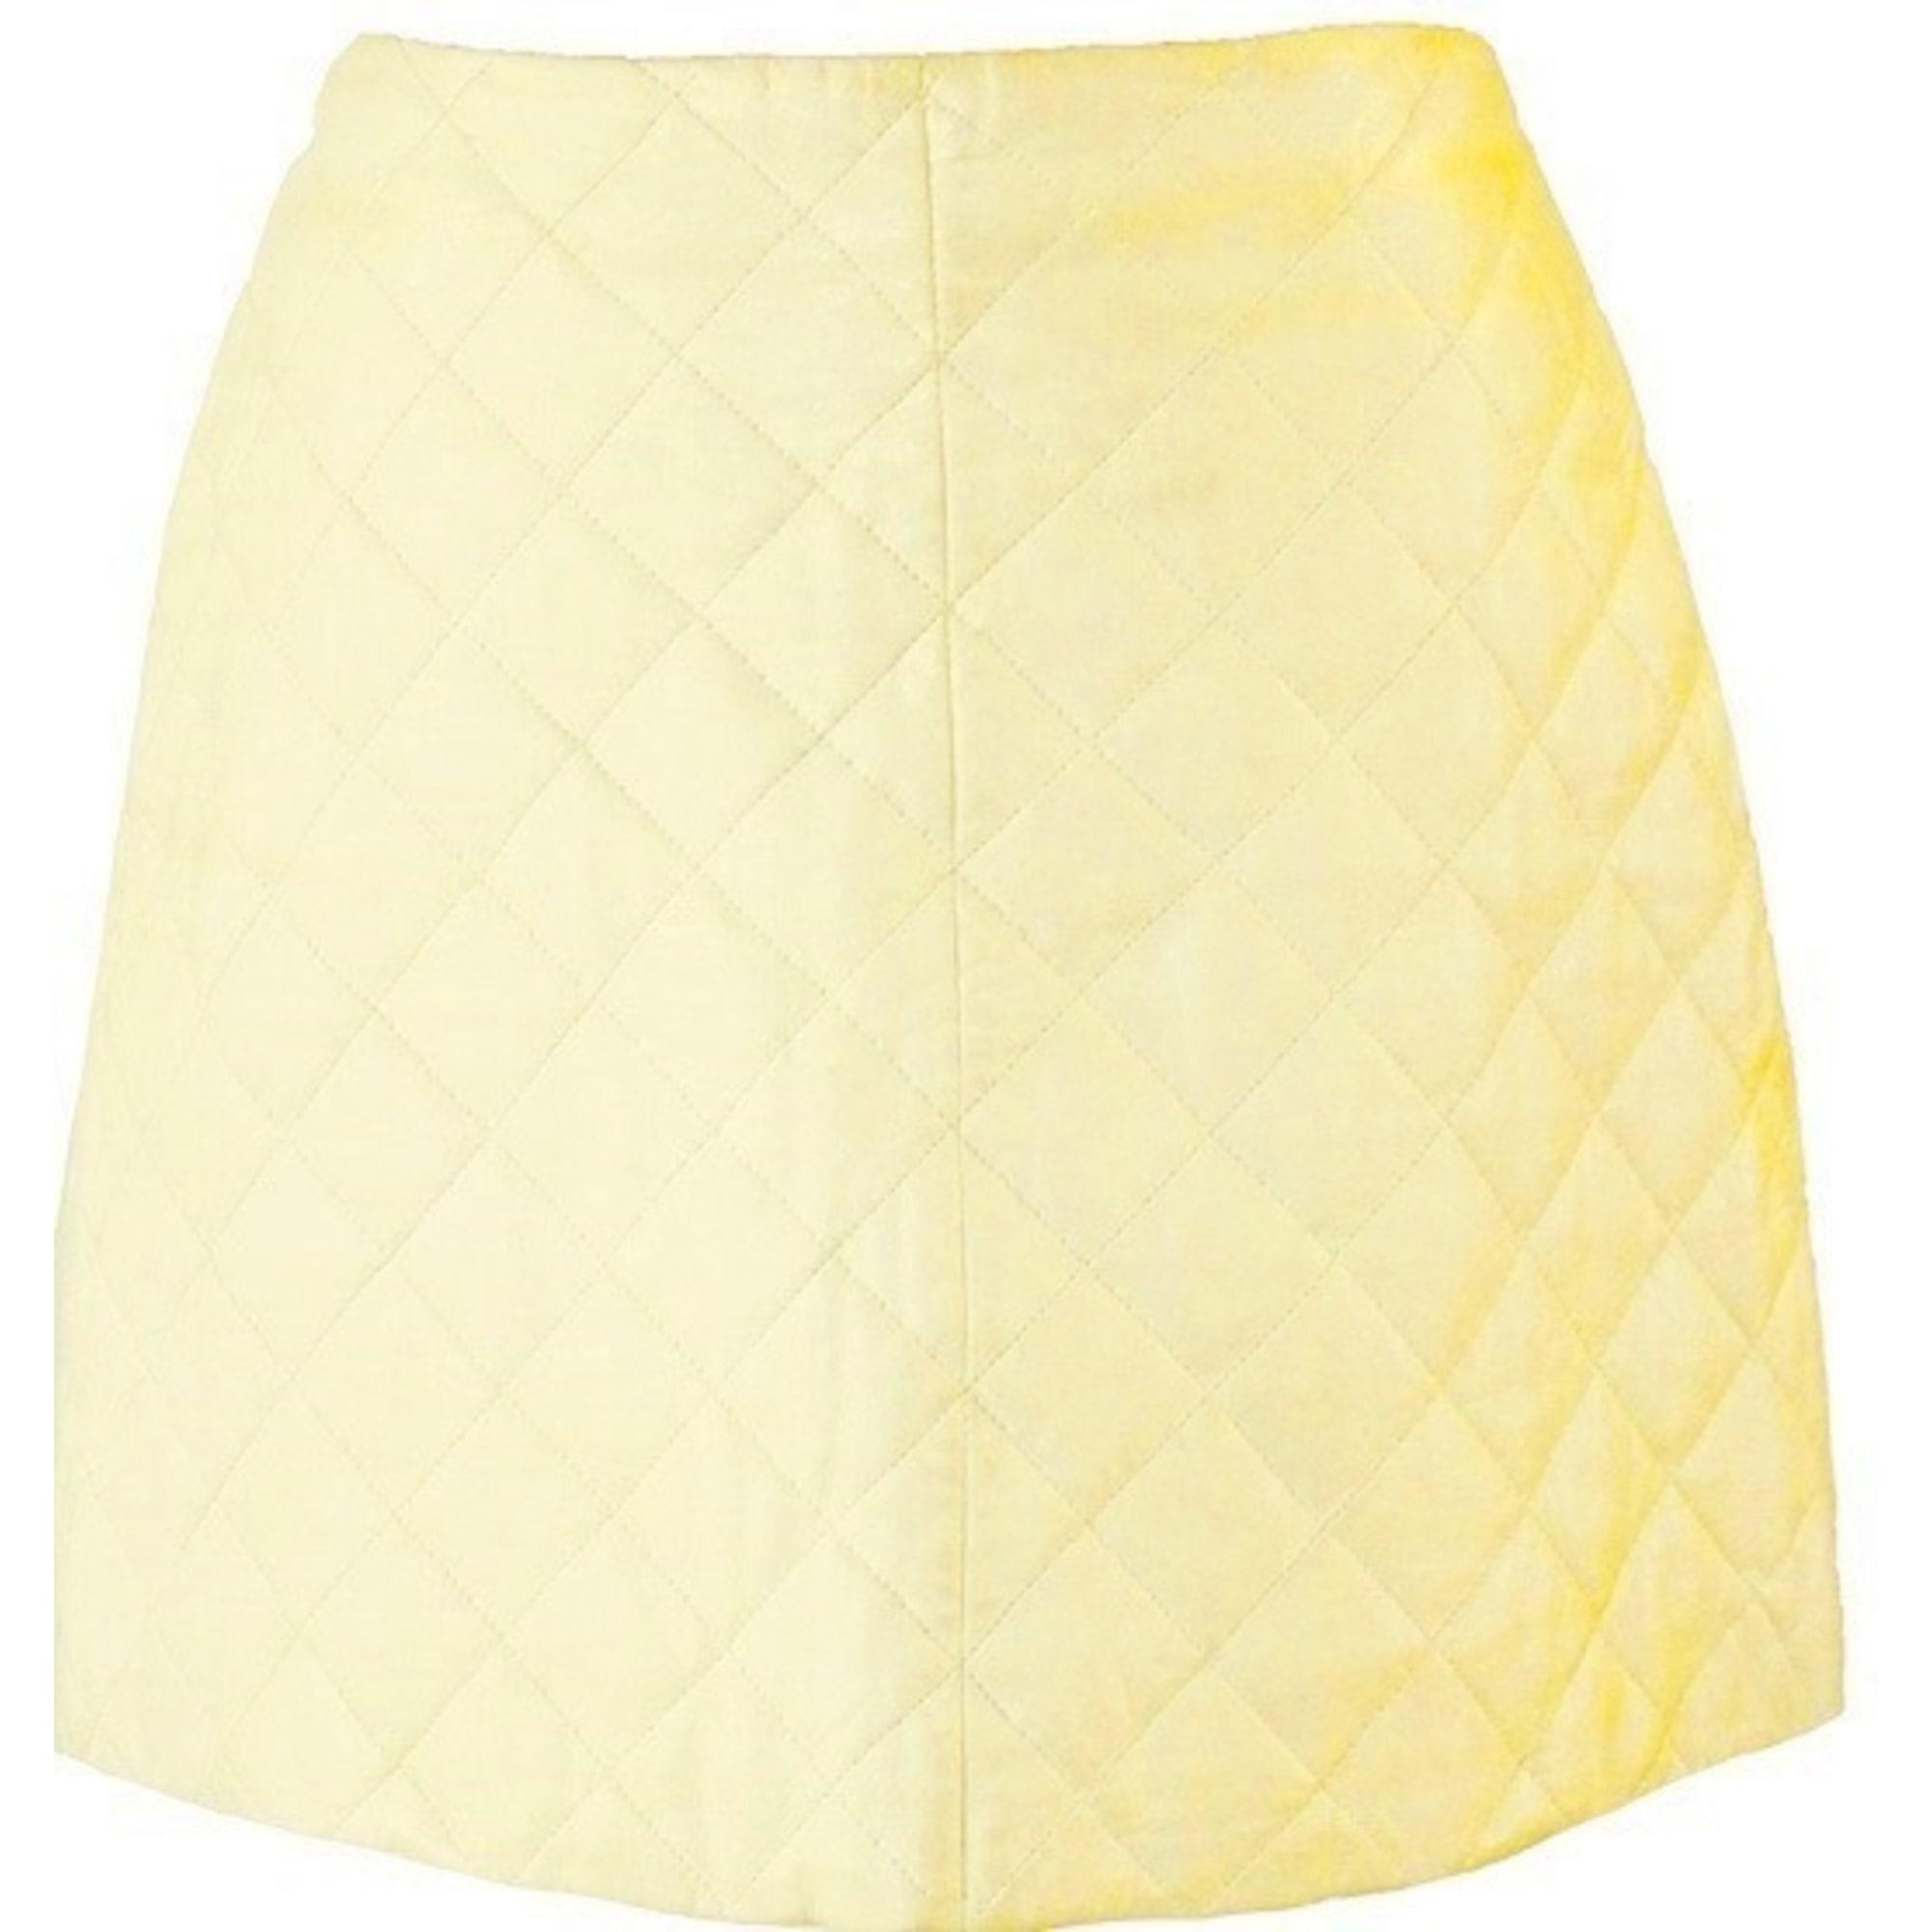 Jupe courte FLORENS Blanc, blanc cassé, écru